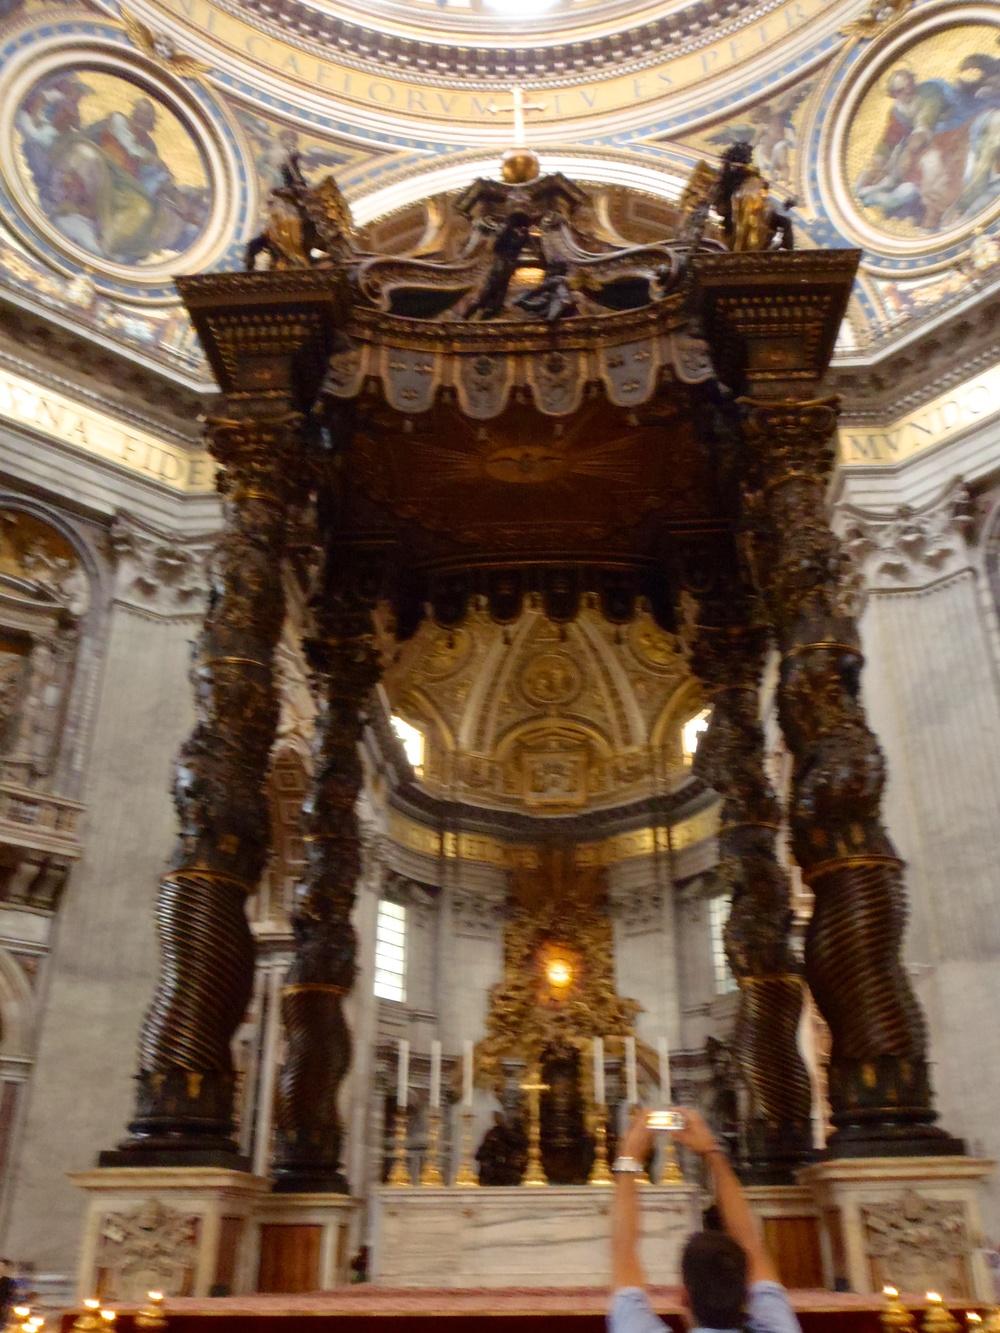 CRO Italy web 2013 - 051.jpg